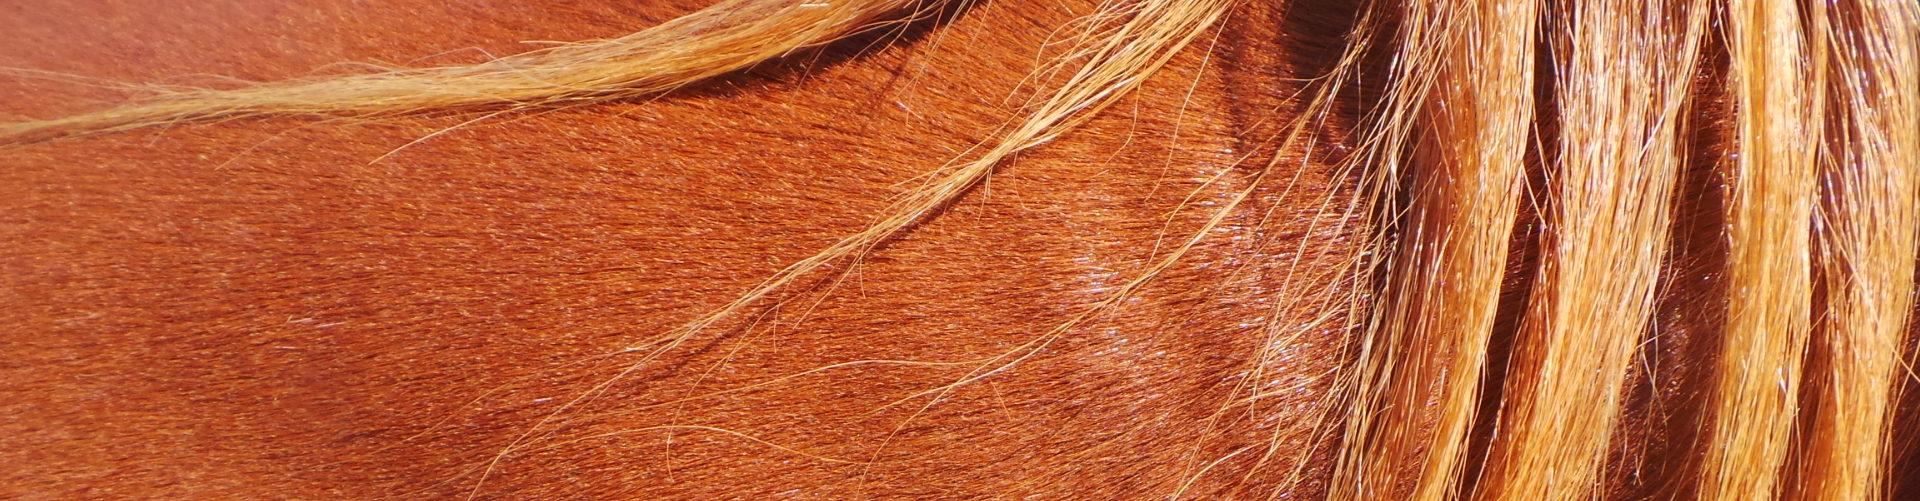 Flank paardners